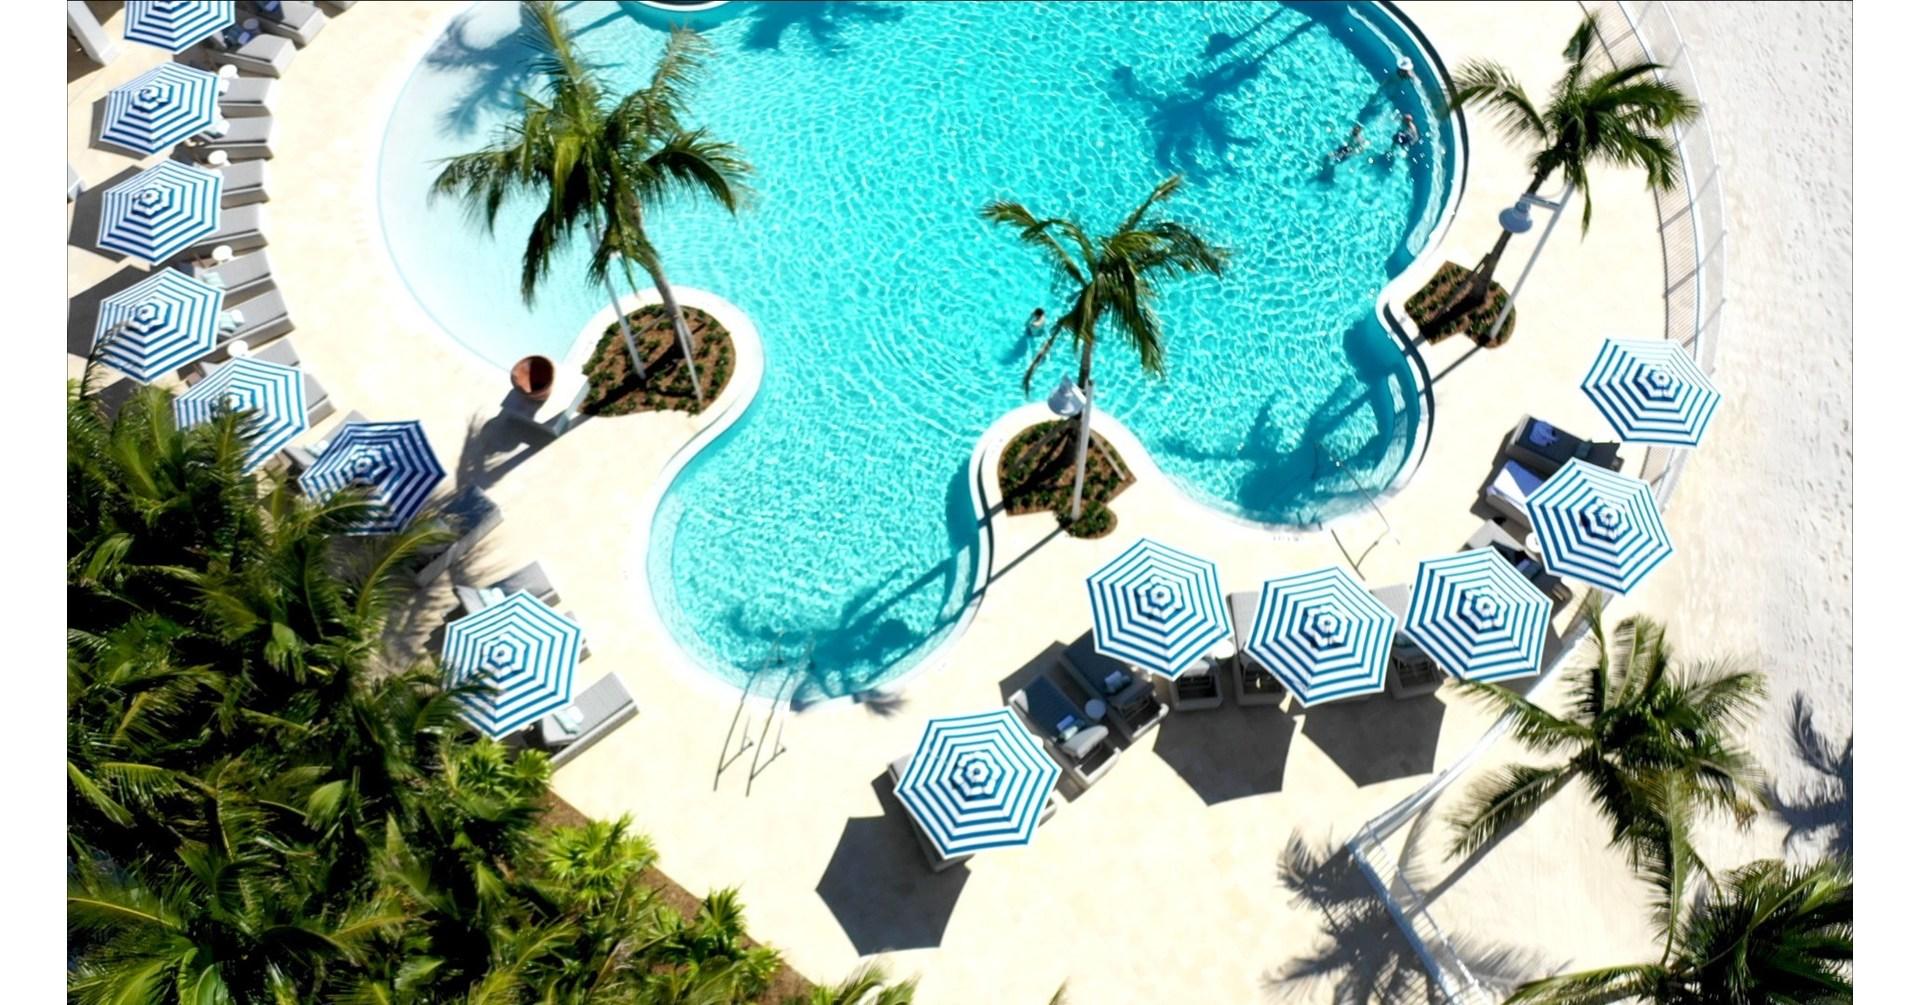 Isla Bella Beach Resort Officially Opens as Florida Keys